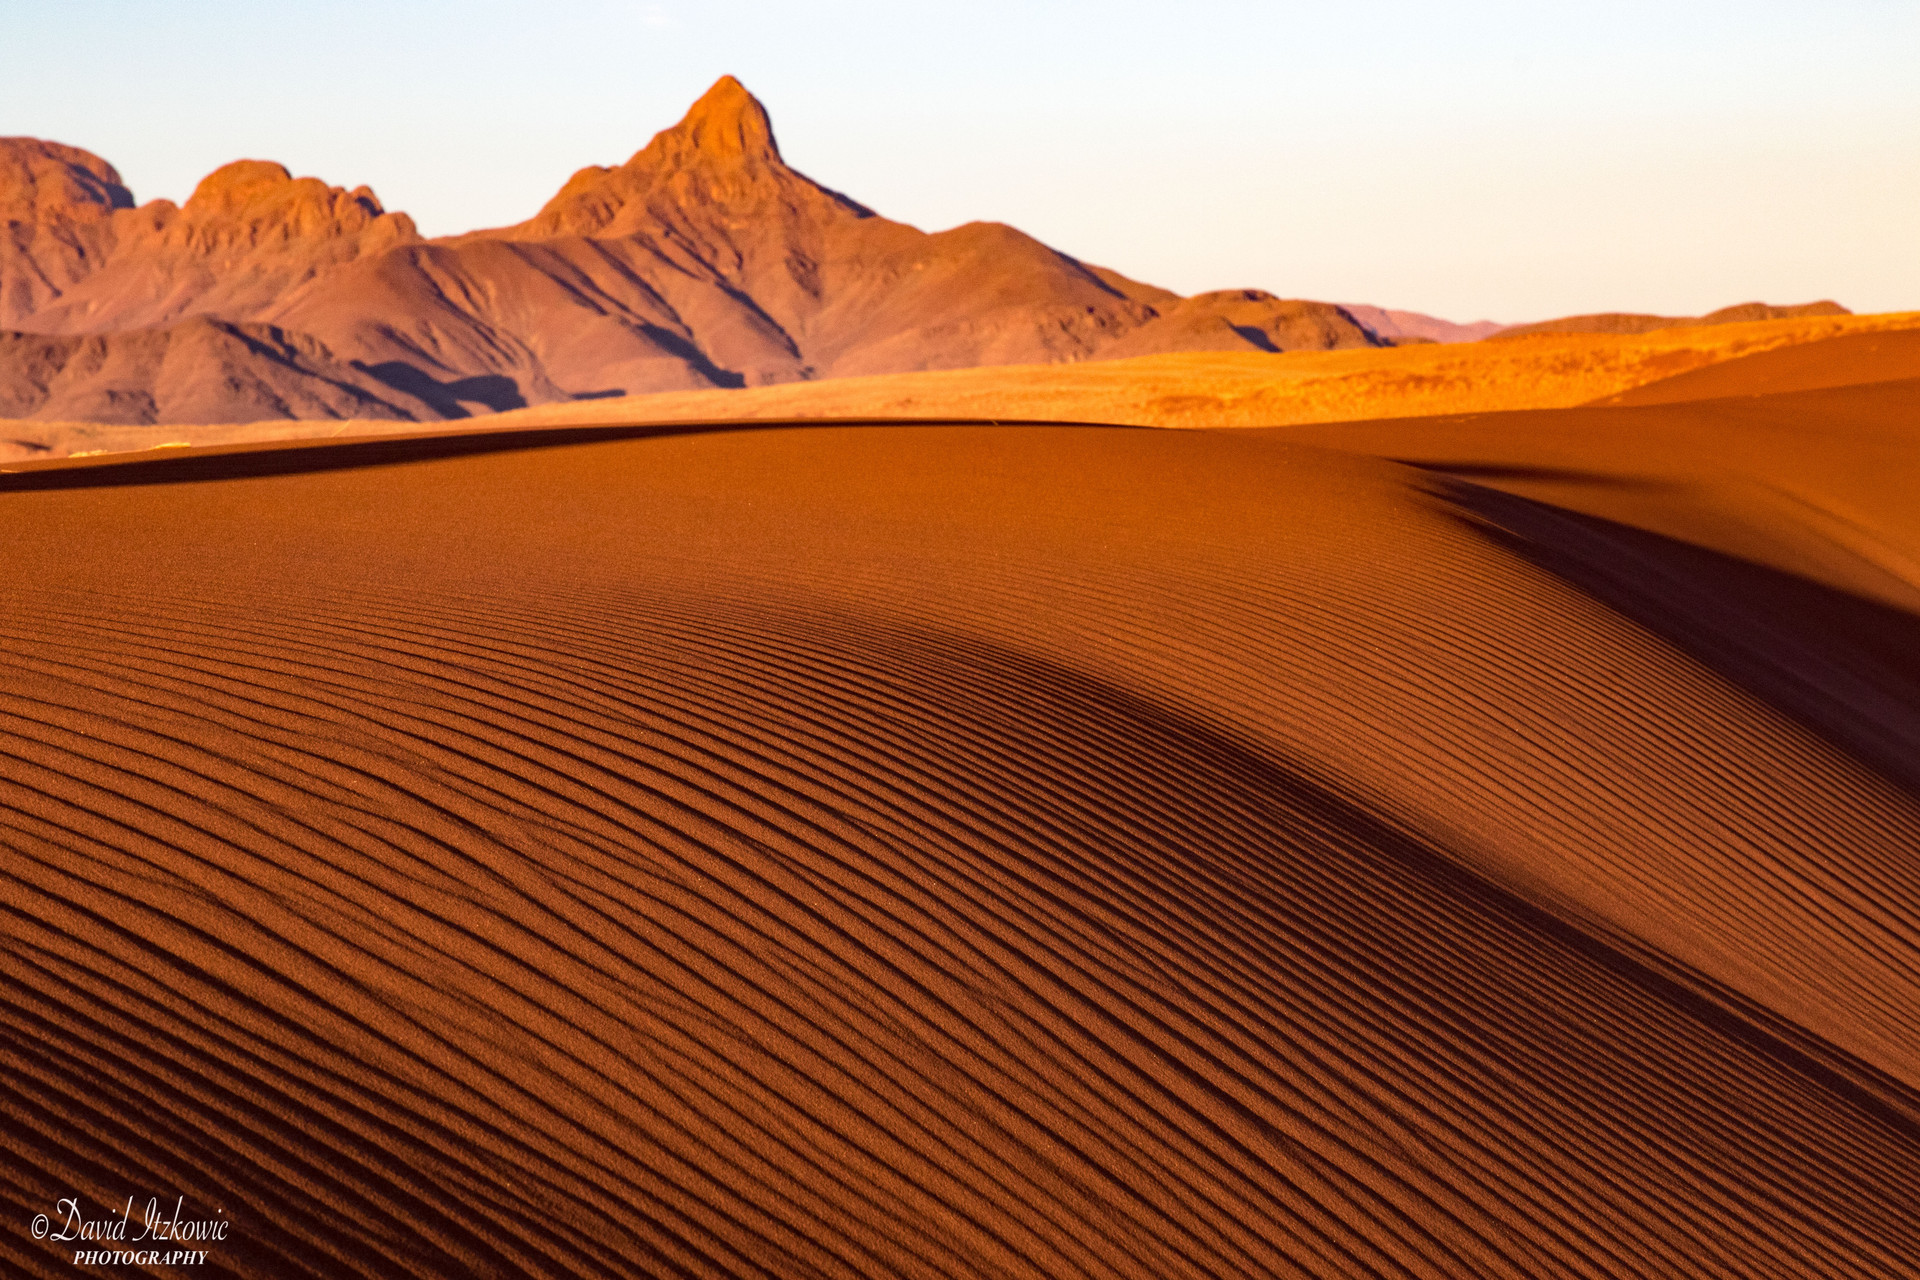 sand dune at dusk